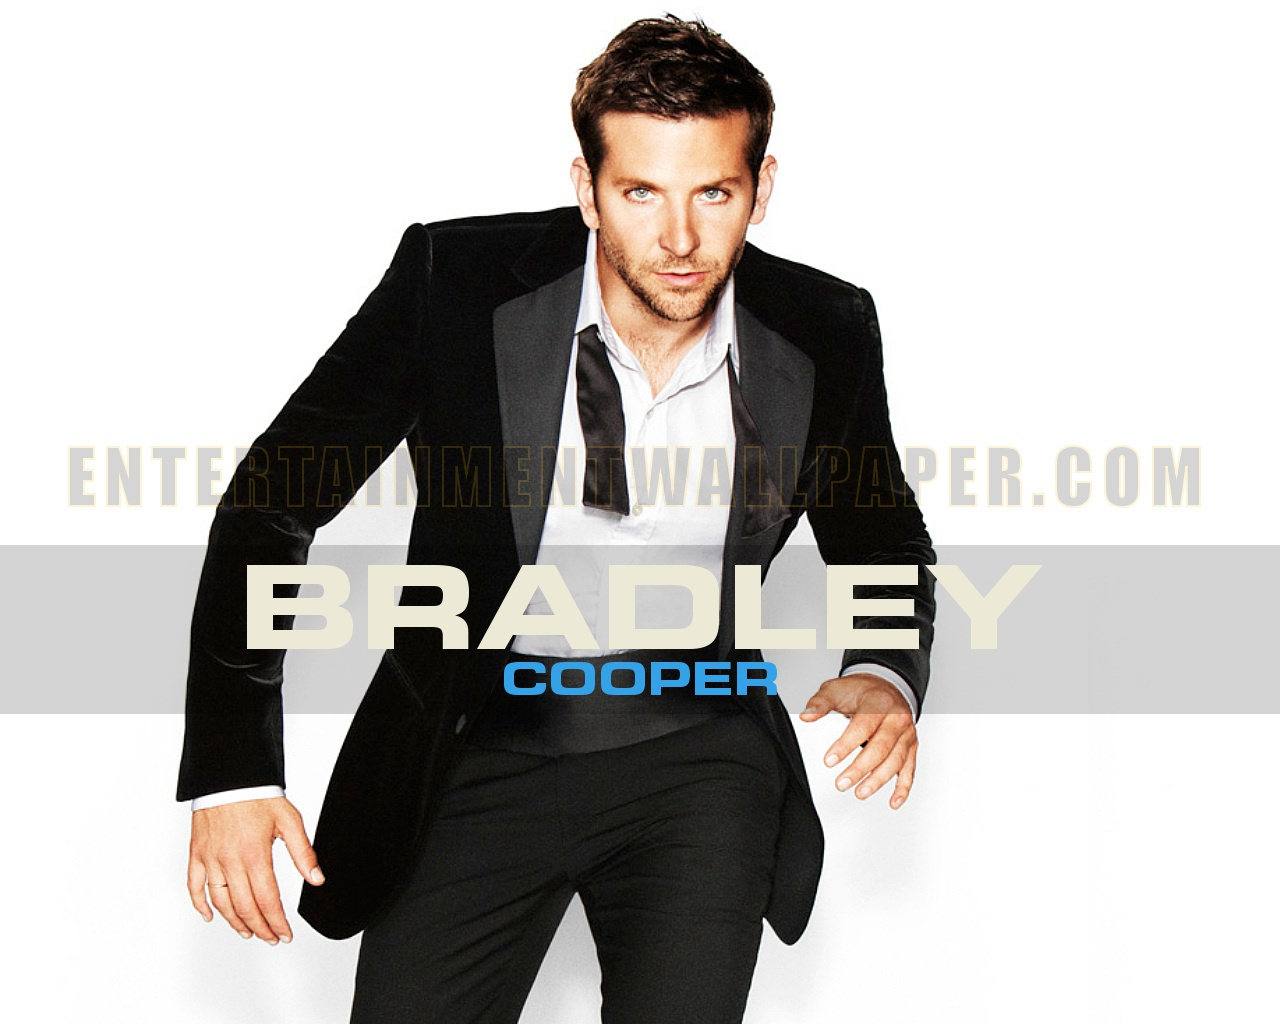 bradley cooper wallpaper 30039502 size 1280x1024 more bradley cooper 1280x1024